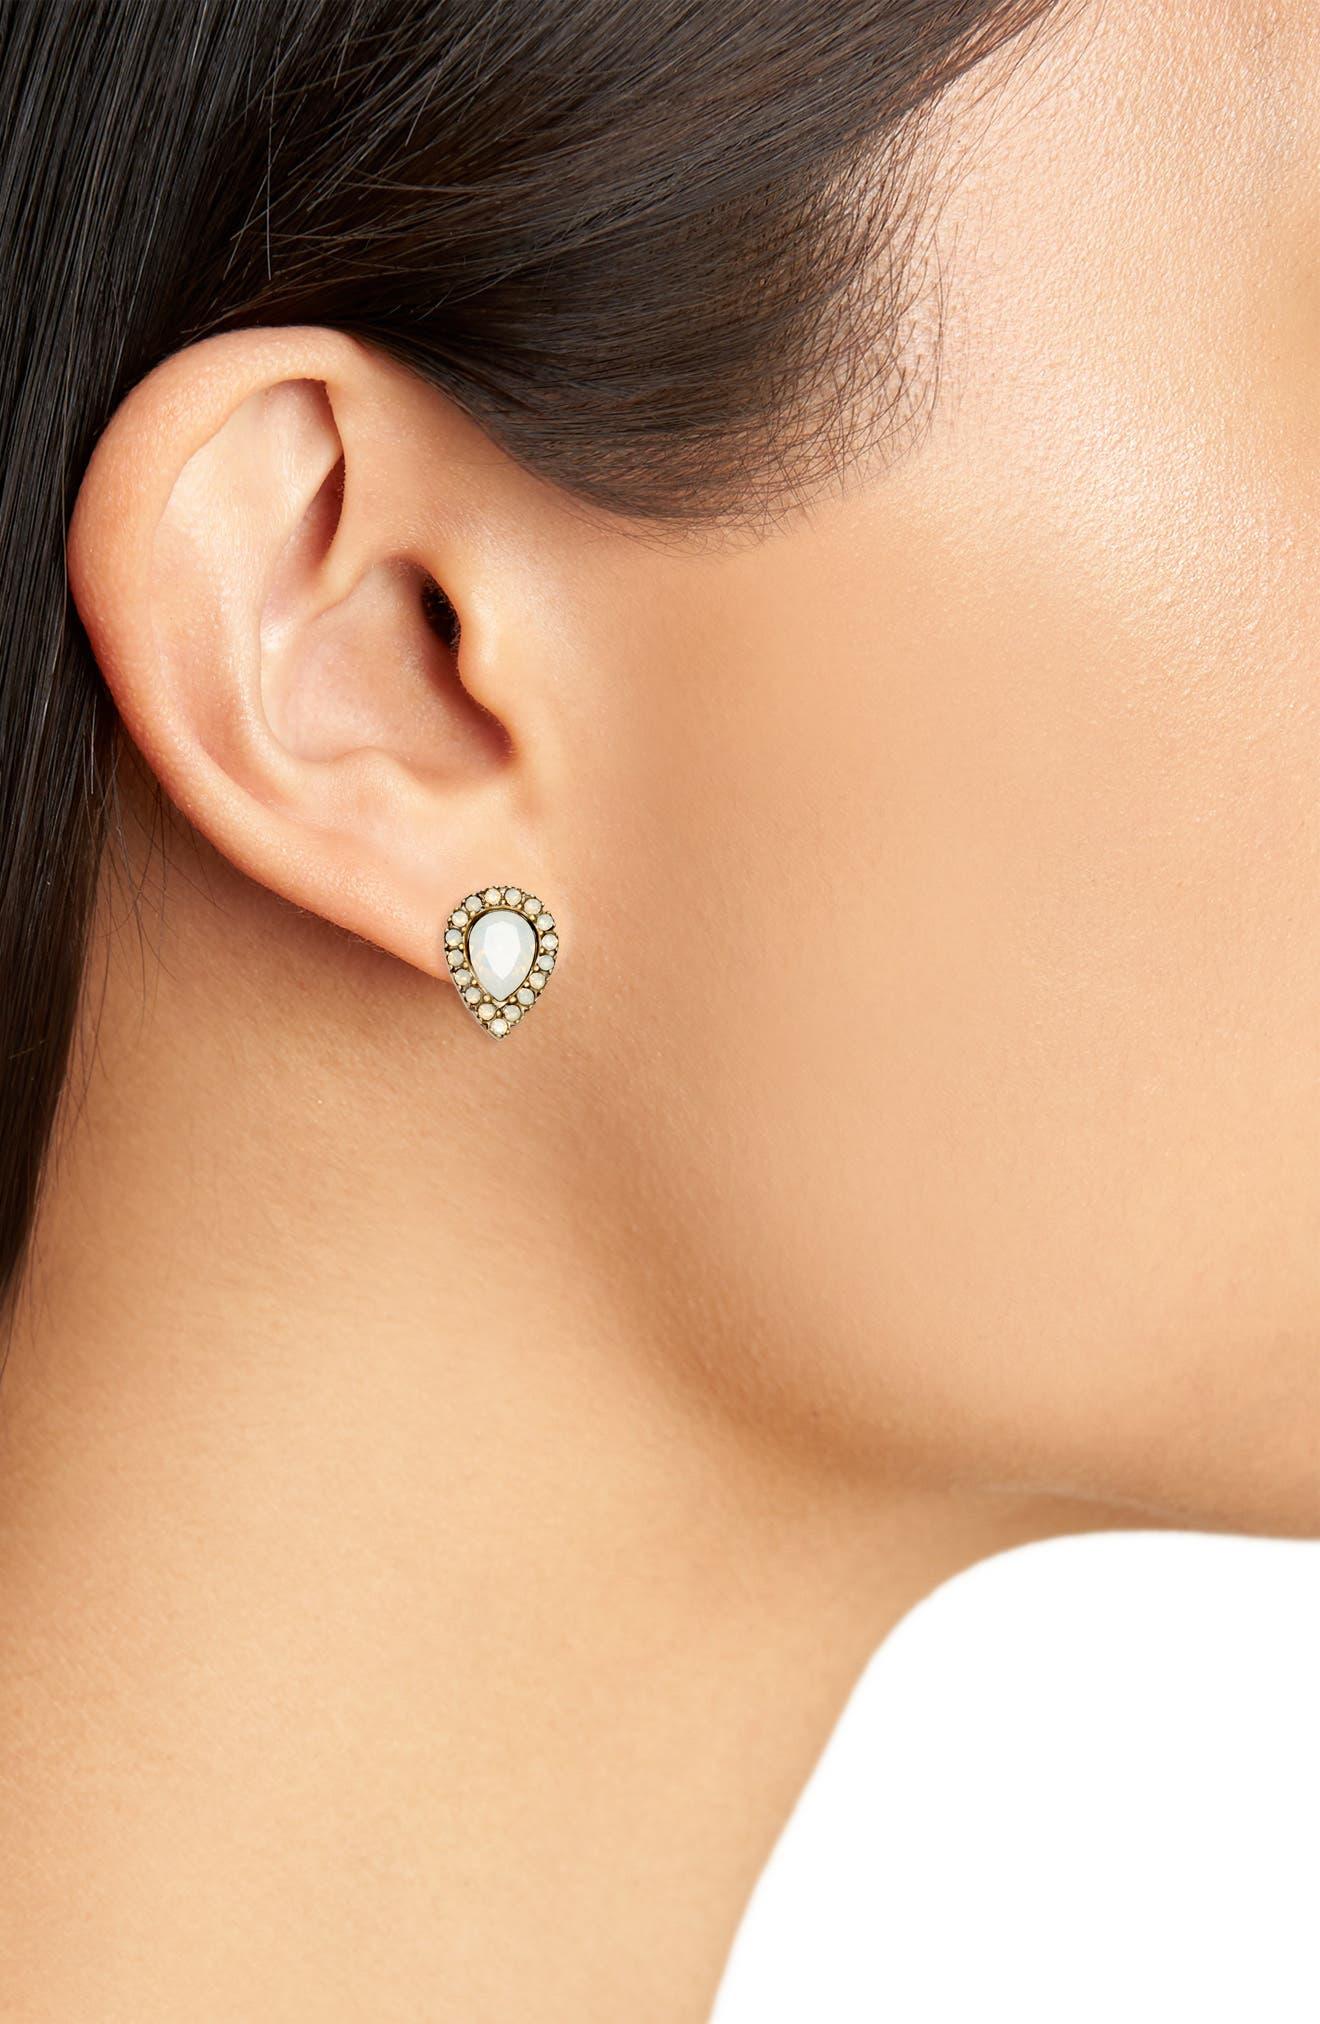 Jamie Teardrop Stud Earrings,                             Alternate thumbnail 2, color,                             GOLD/ WHITE